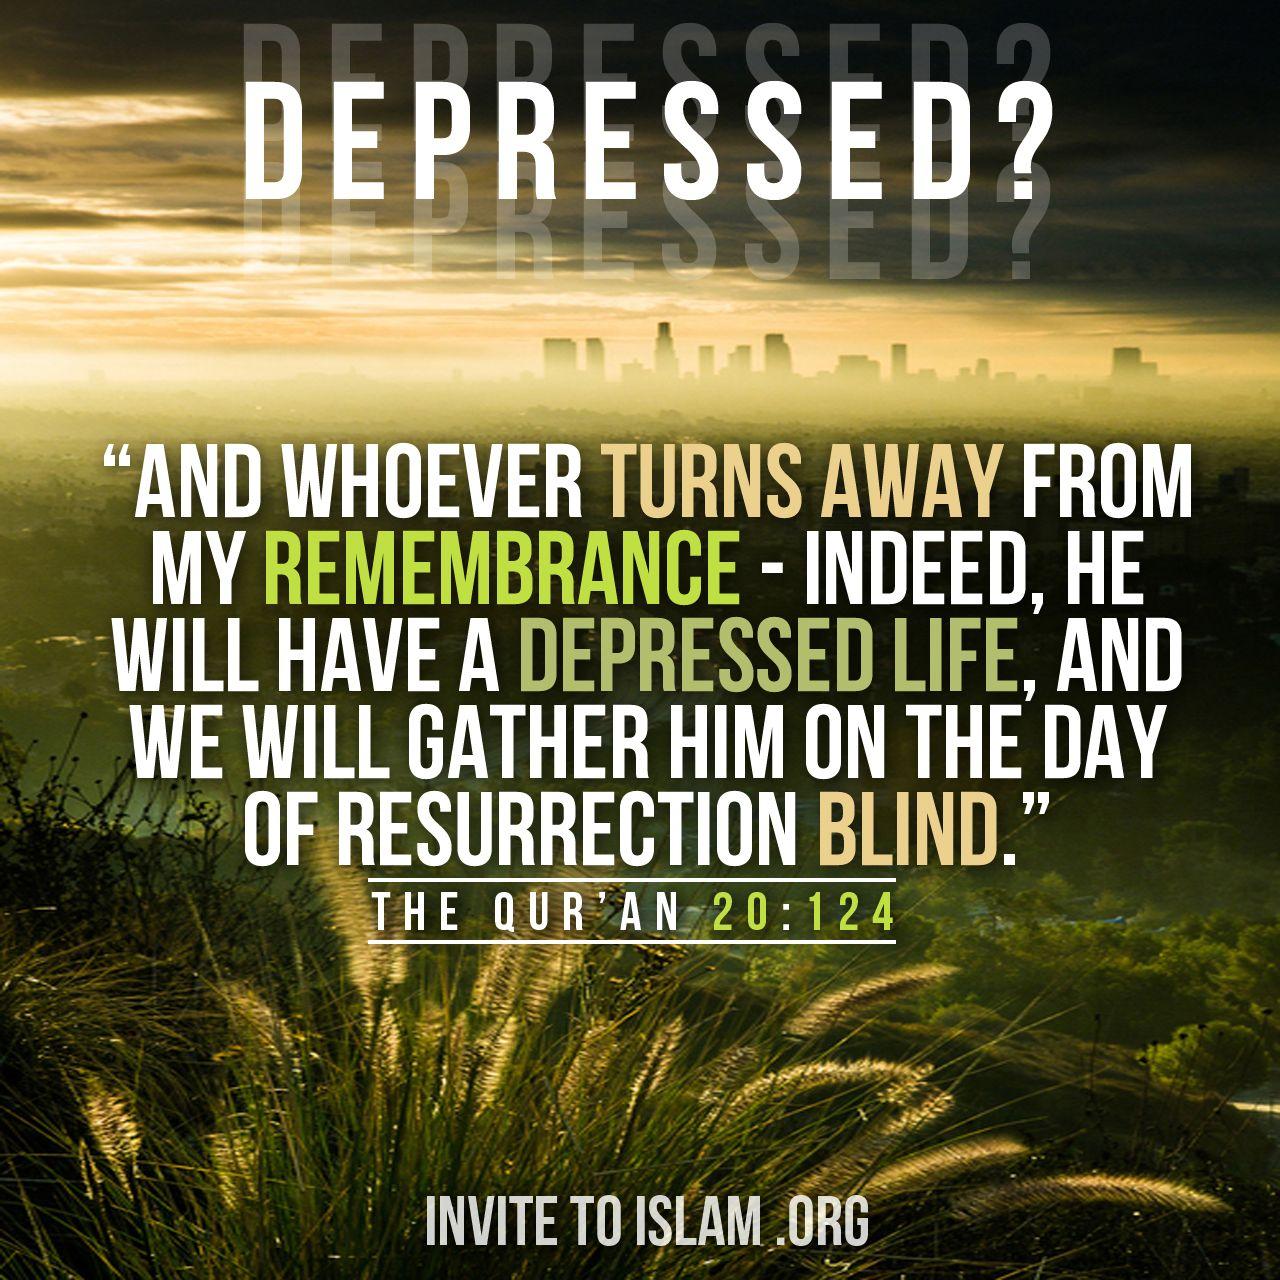 Islamic Quotes For Death Of A Loved One: (وَمَنْ أَعْرَضَ عَن ذِكْرِي فَإِنَّ لَهُ مَعِيشَةً ضَنكًا